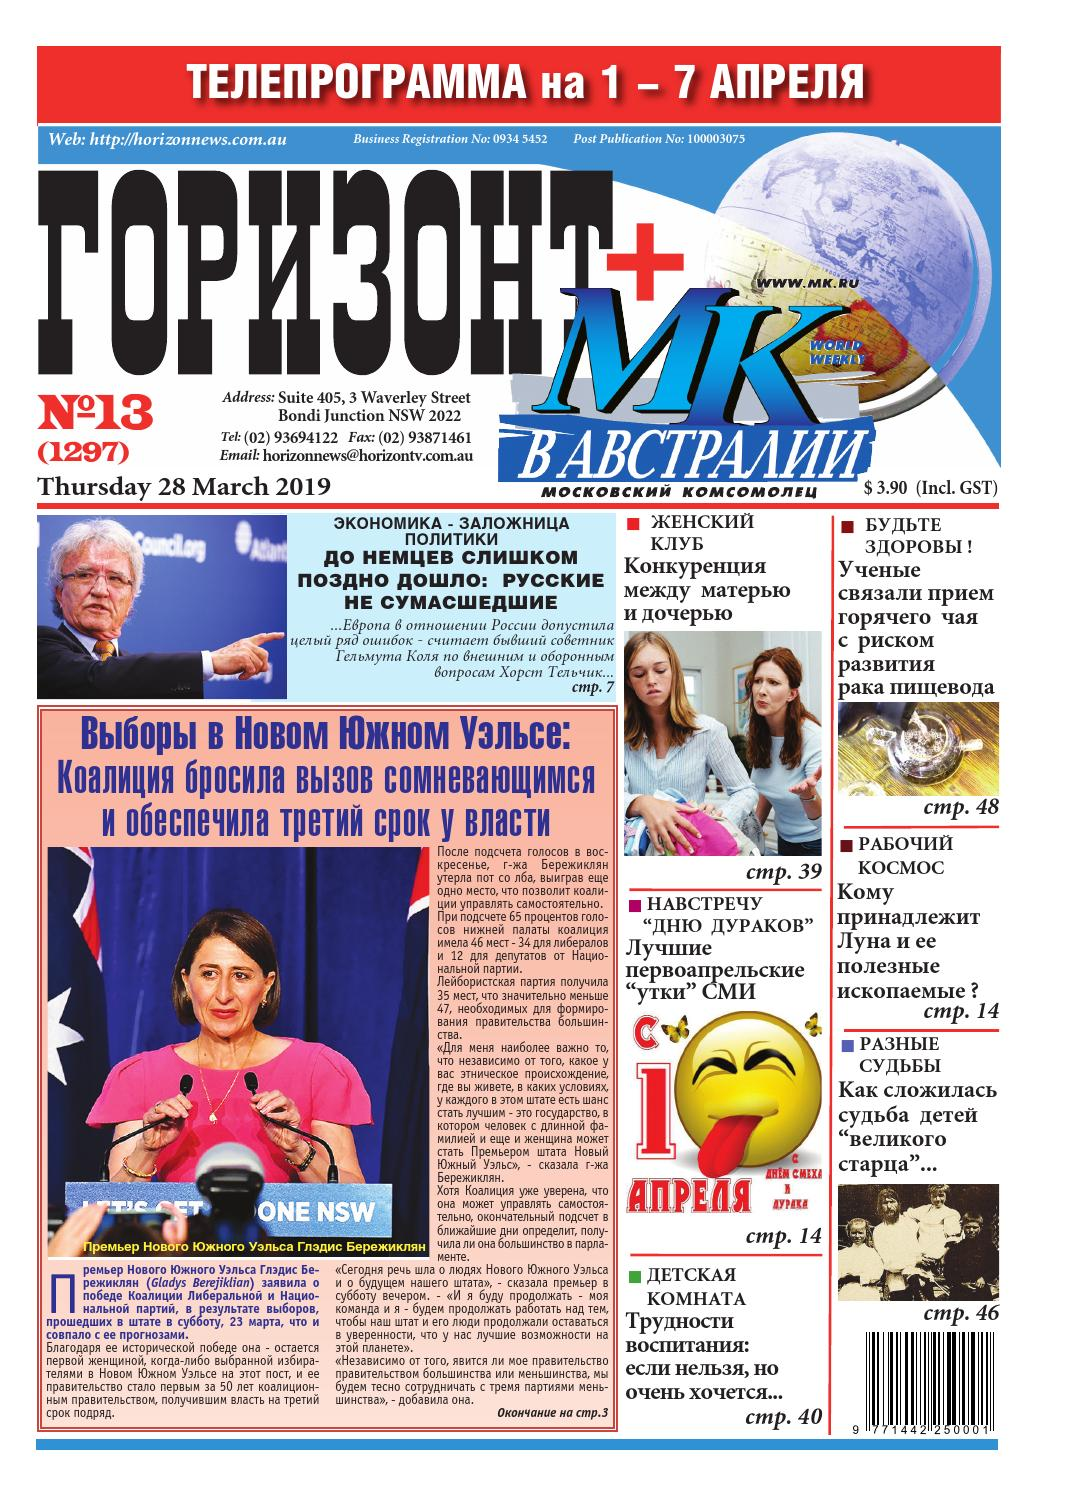 d4fe19cd4ad Горизонт № 13 by Horizon Media Group - issuu